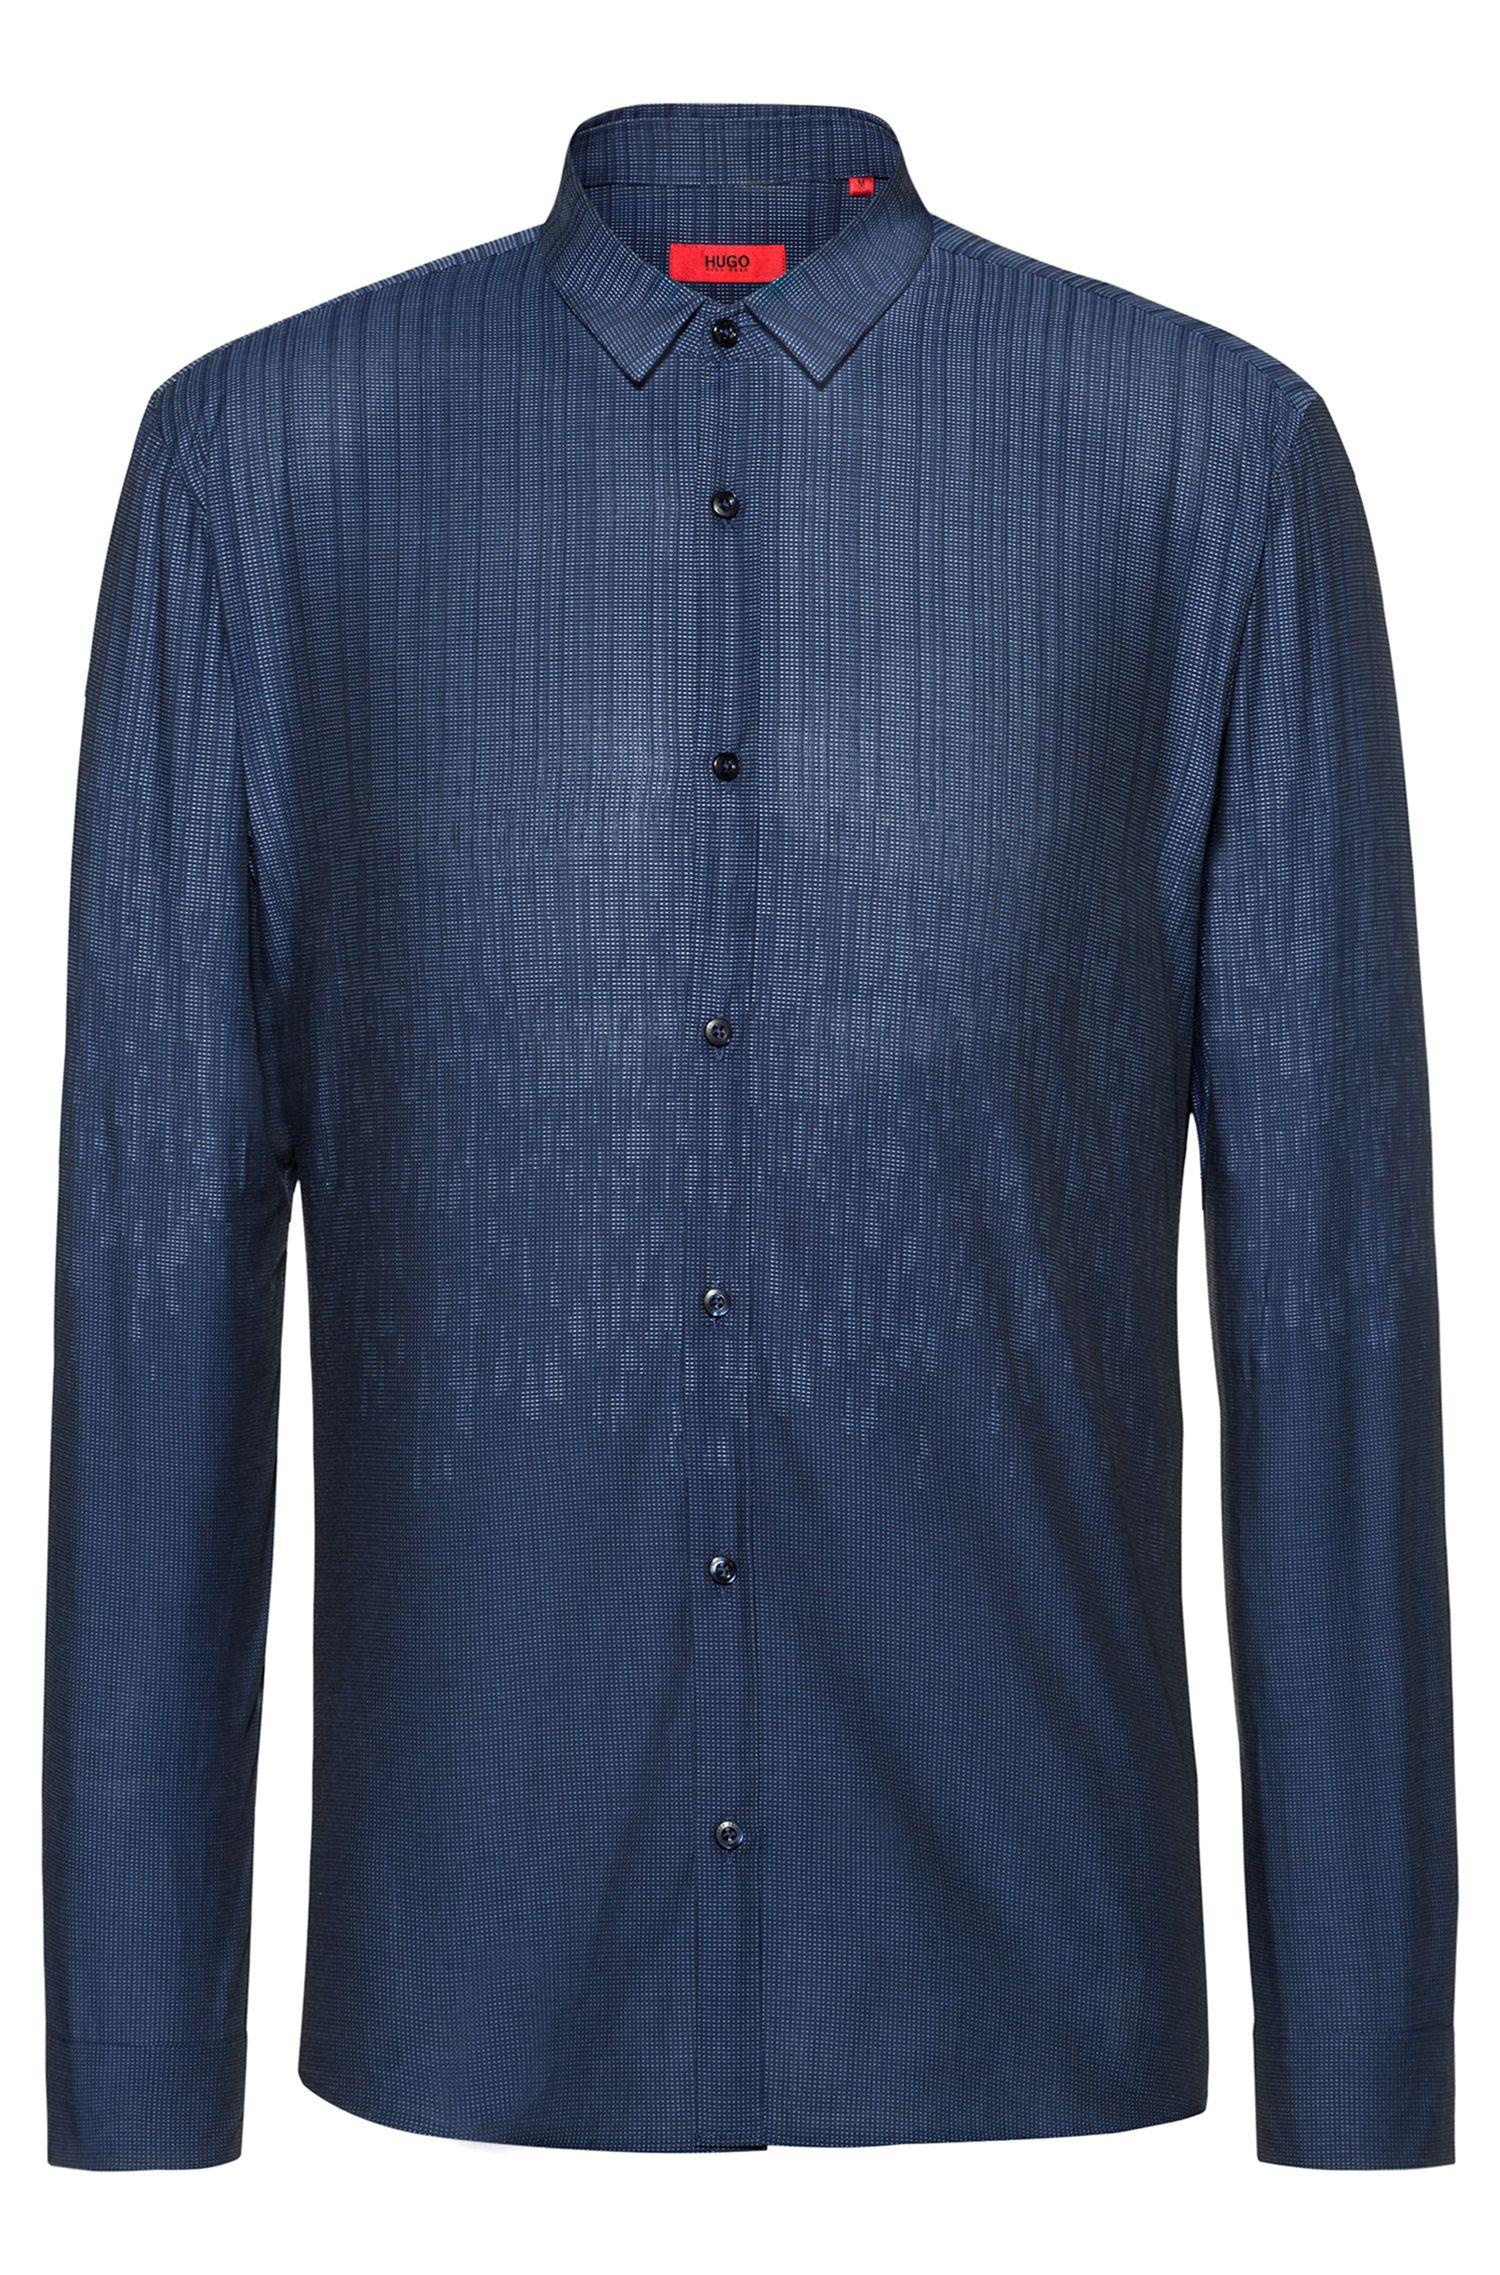 Extra-slim-fit cotton shirt in degradé jacquard, Dark Blue